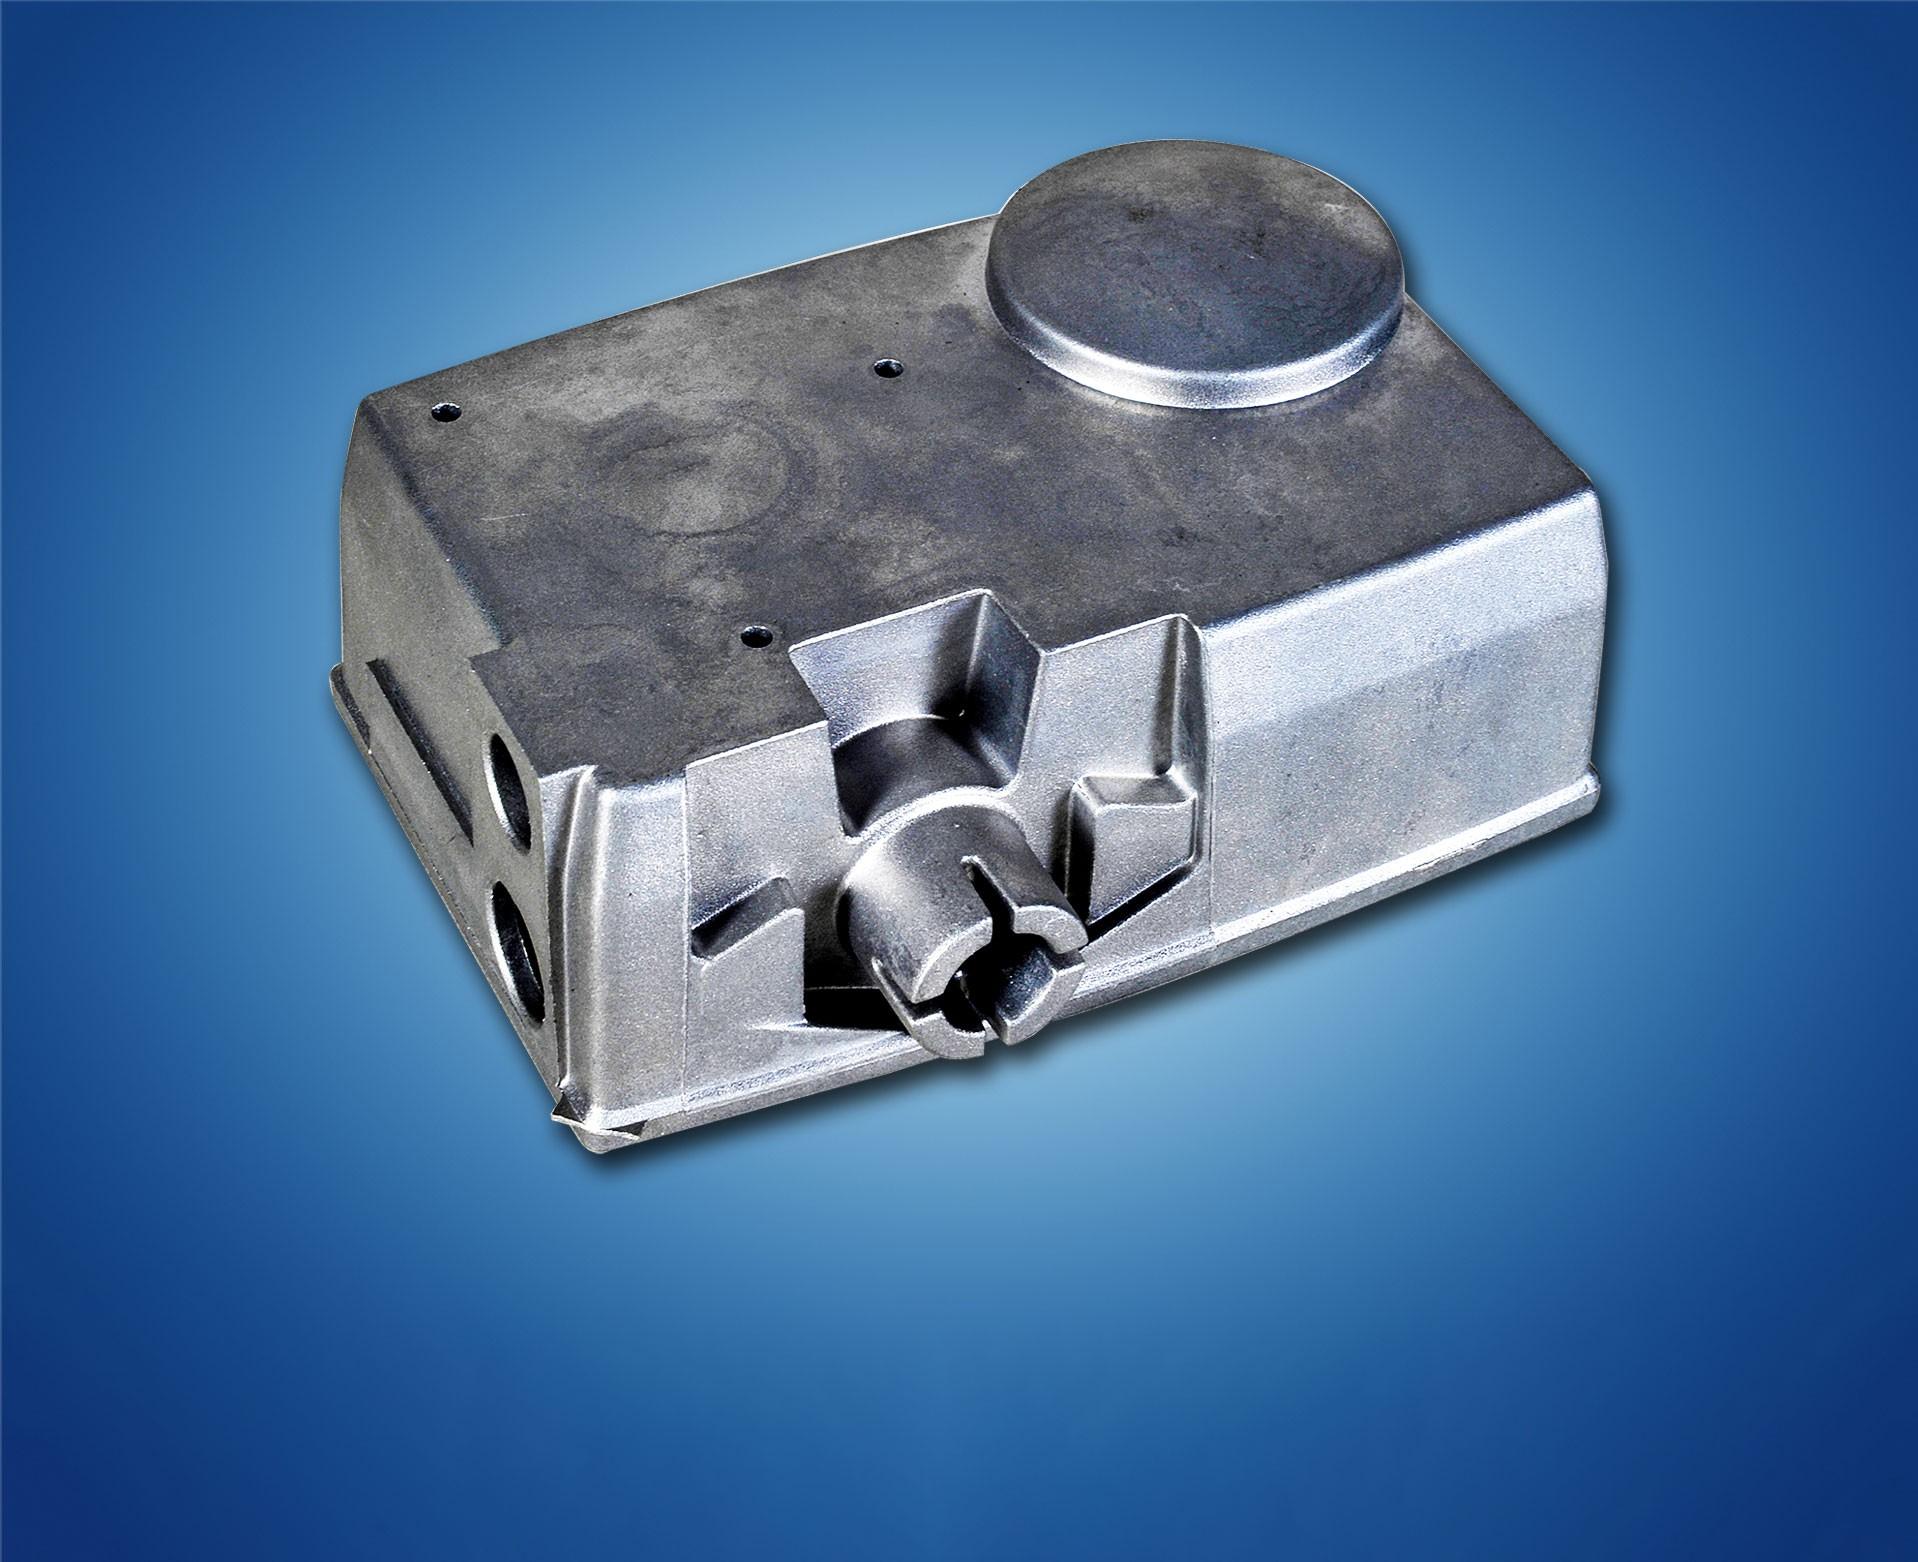 Ero-Projekt-d.o.o.-Toolshop-Werkzeugbau-die-cast-tool-2-danfoss6